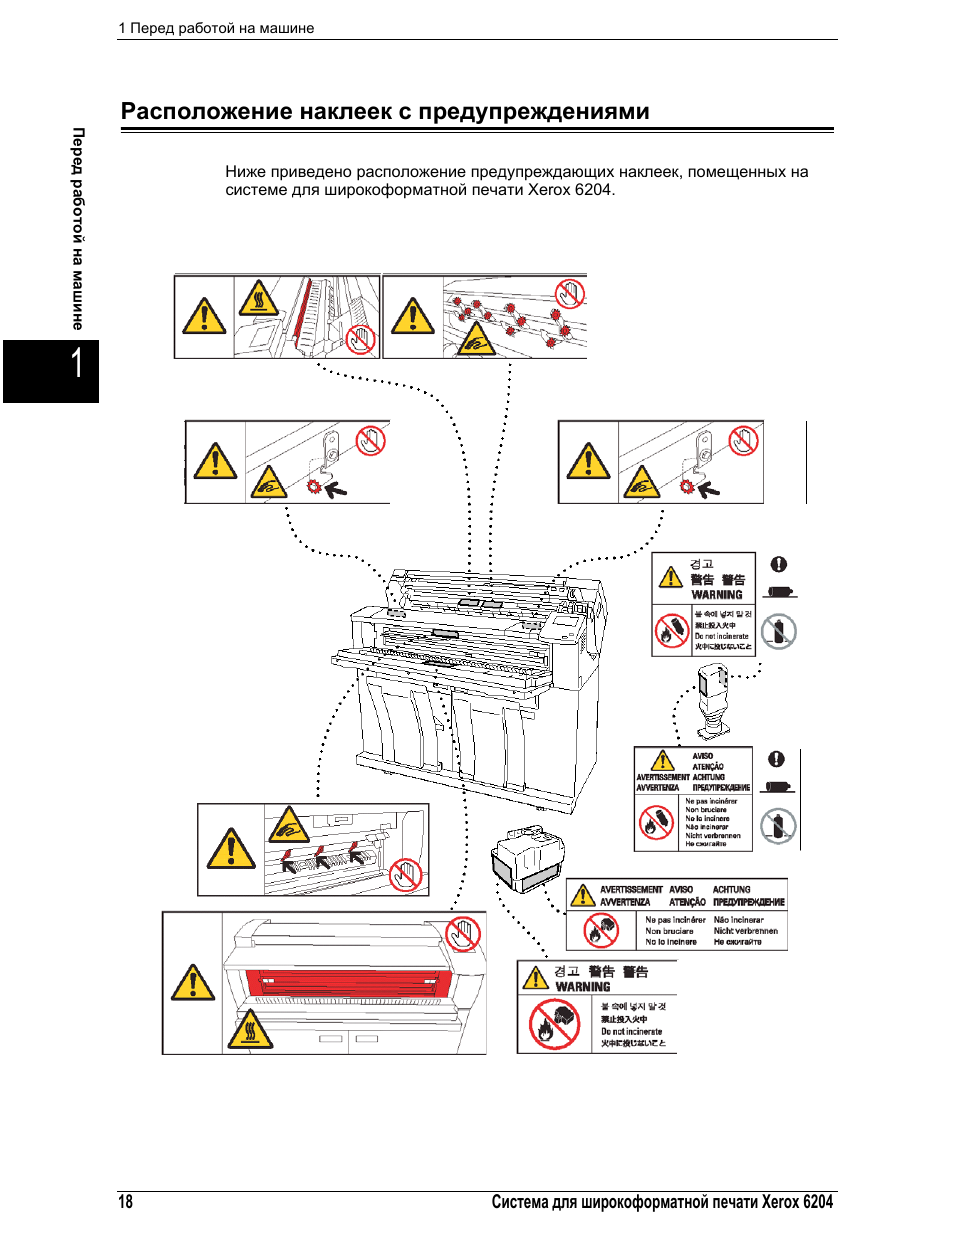 Расположение наклеек с предупреждениями Инструкция по эксплуатации Xerox 6204 RU Страница 26 / 218 Оригинал